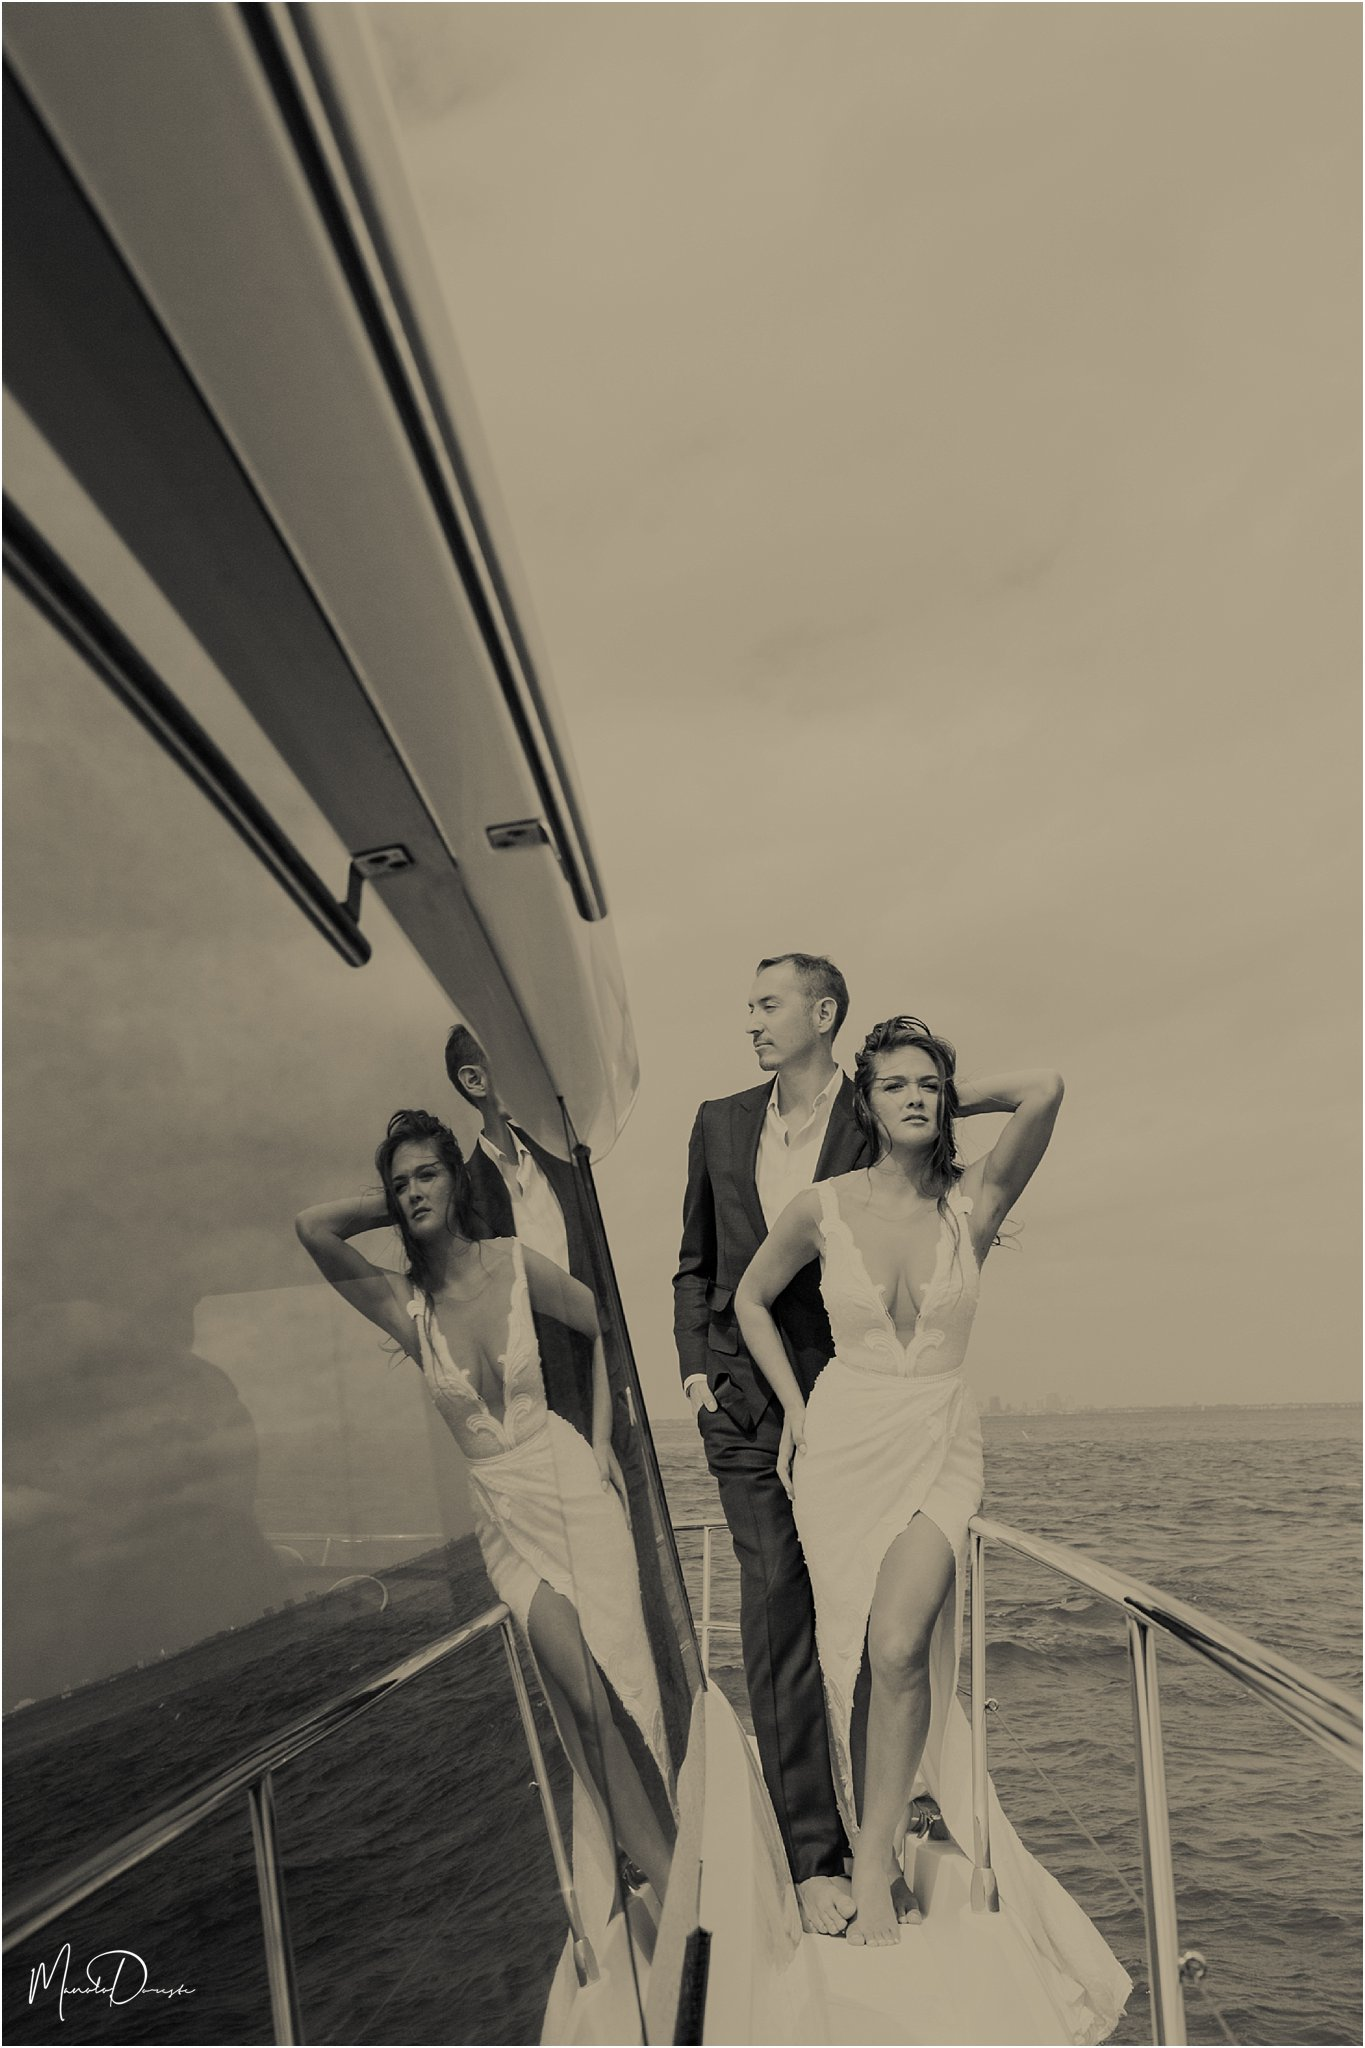 00895_ManoloDoreste_InFocusStudios_Wedding_Family_Photography_Miami_MiamiPhotographer.jpg